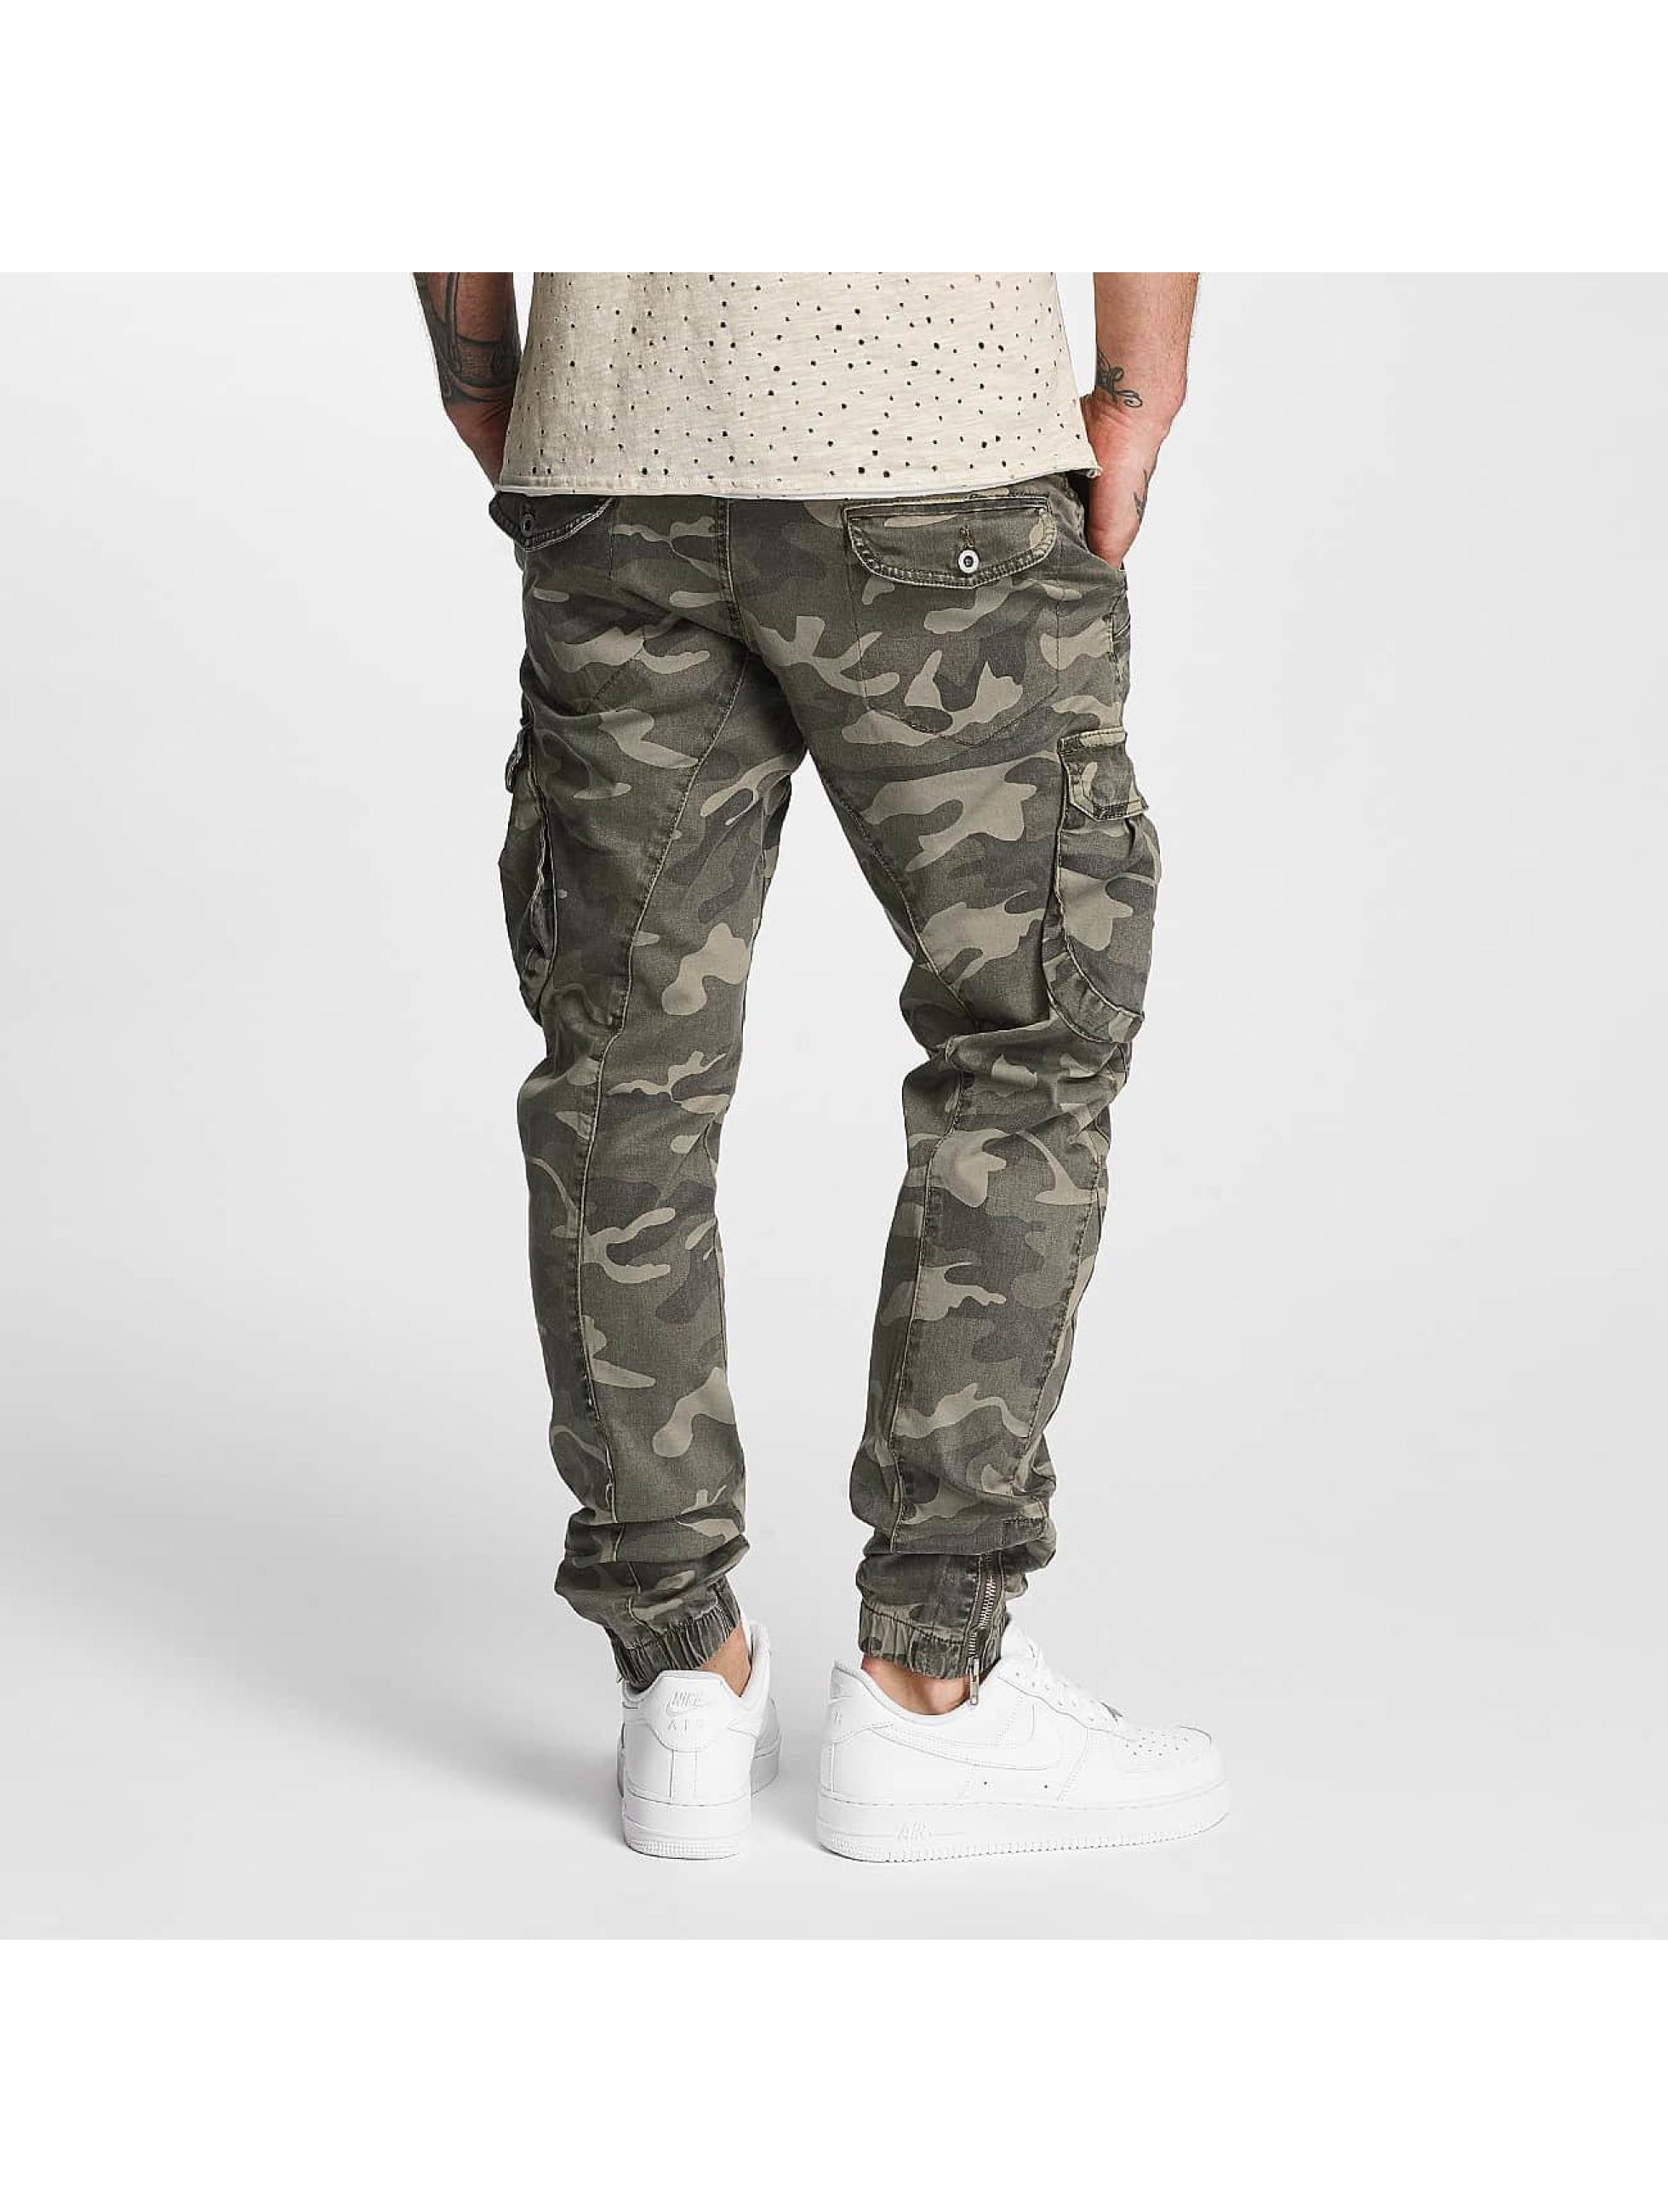 Red Bridge Pantalon cargo Army camouflage